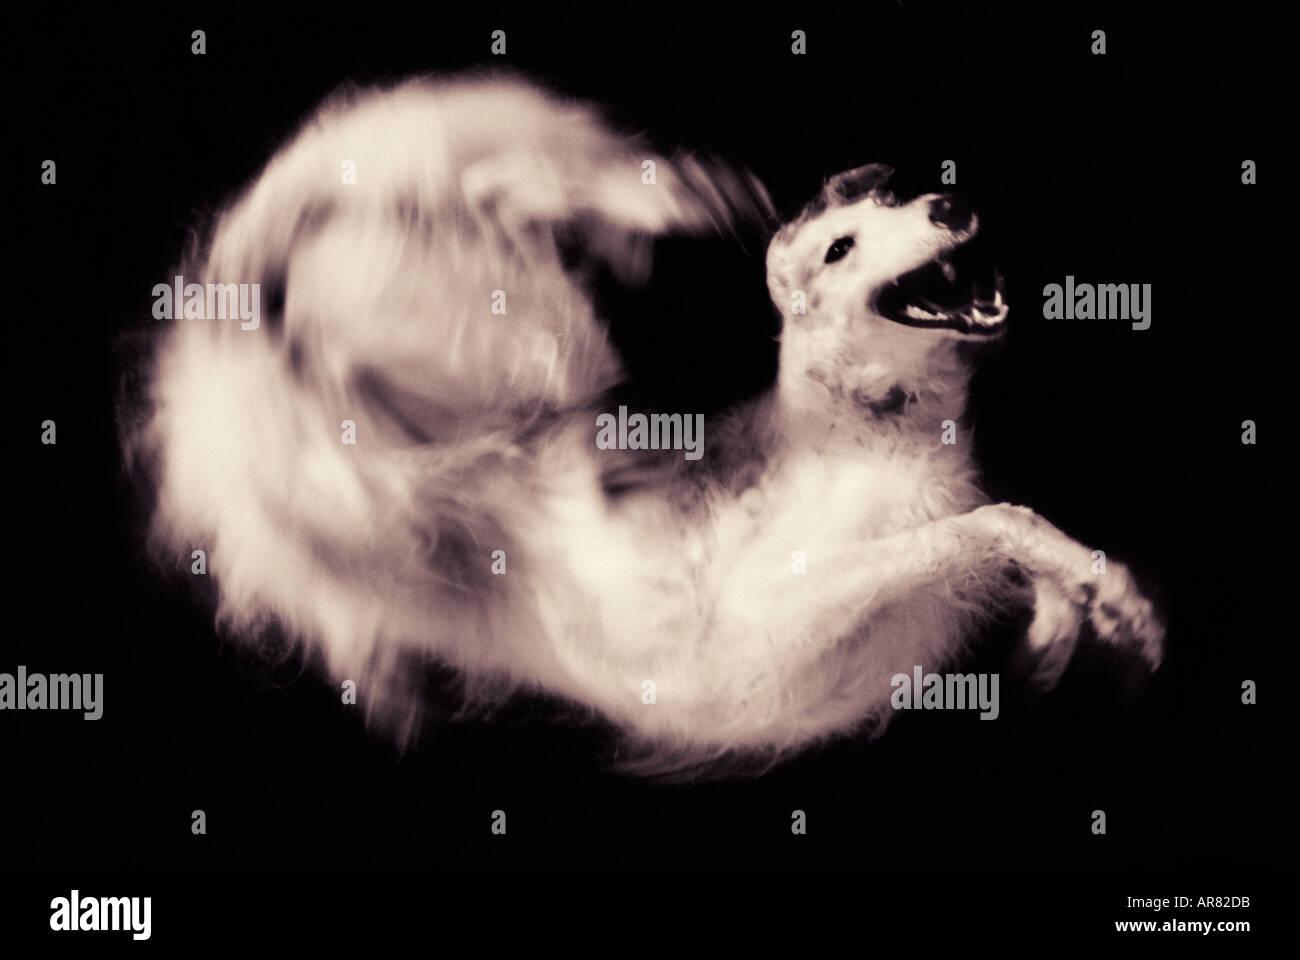 Borzoi dog jumping and twisting - Stock Image